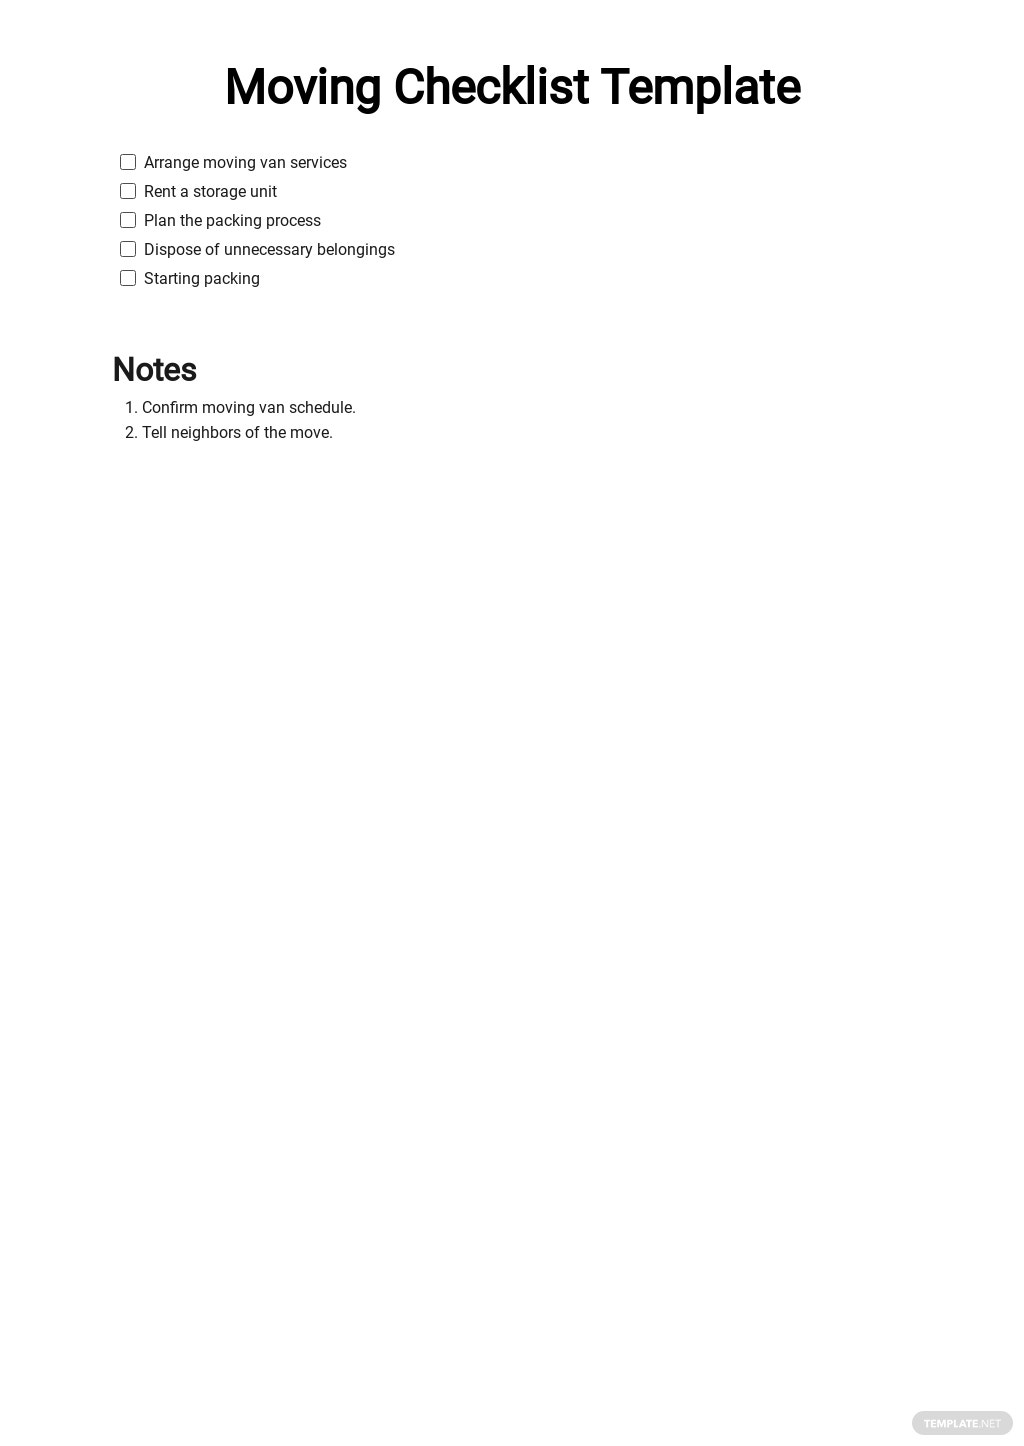 Moving Checklist Template.jpe